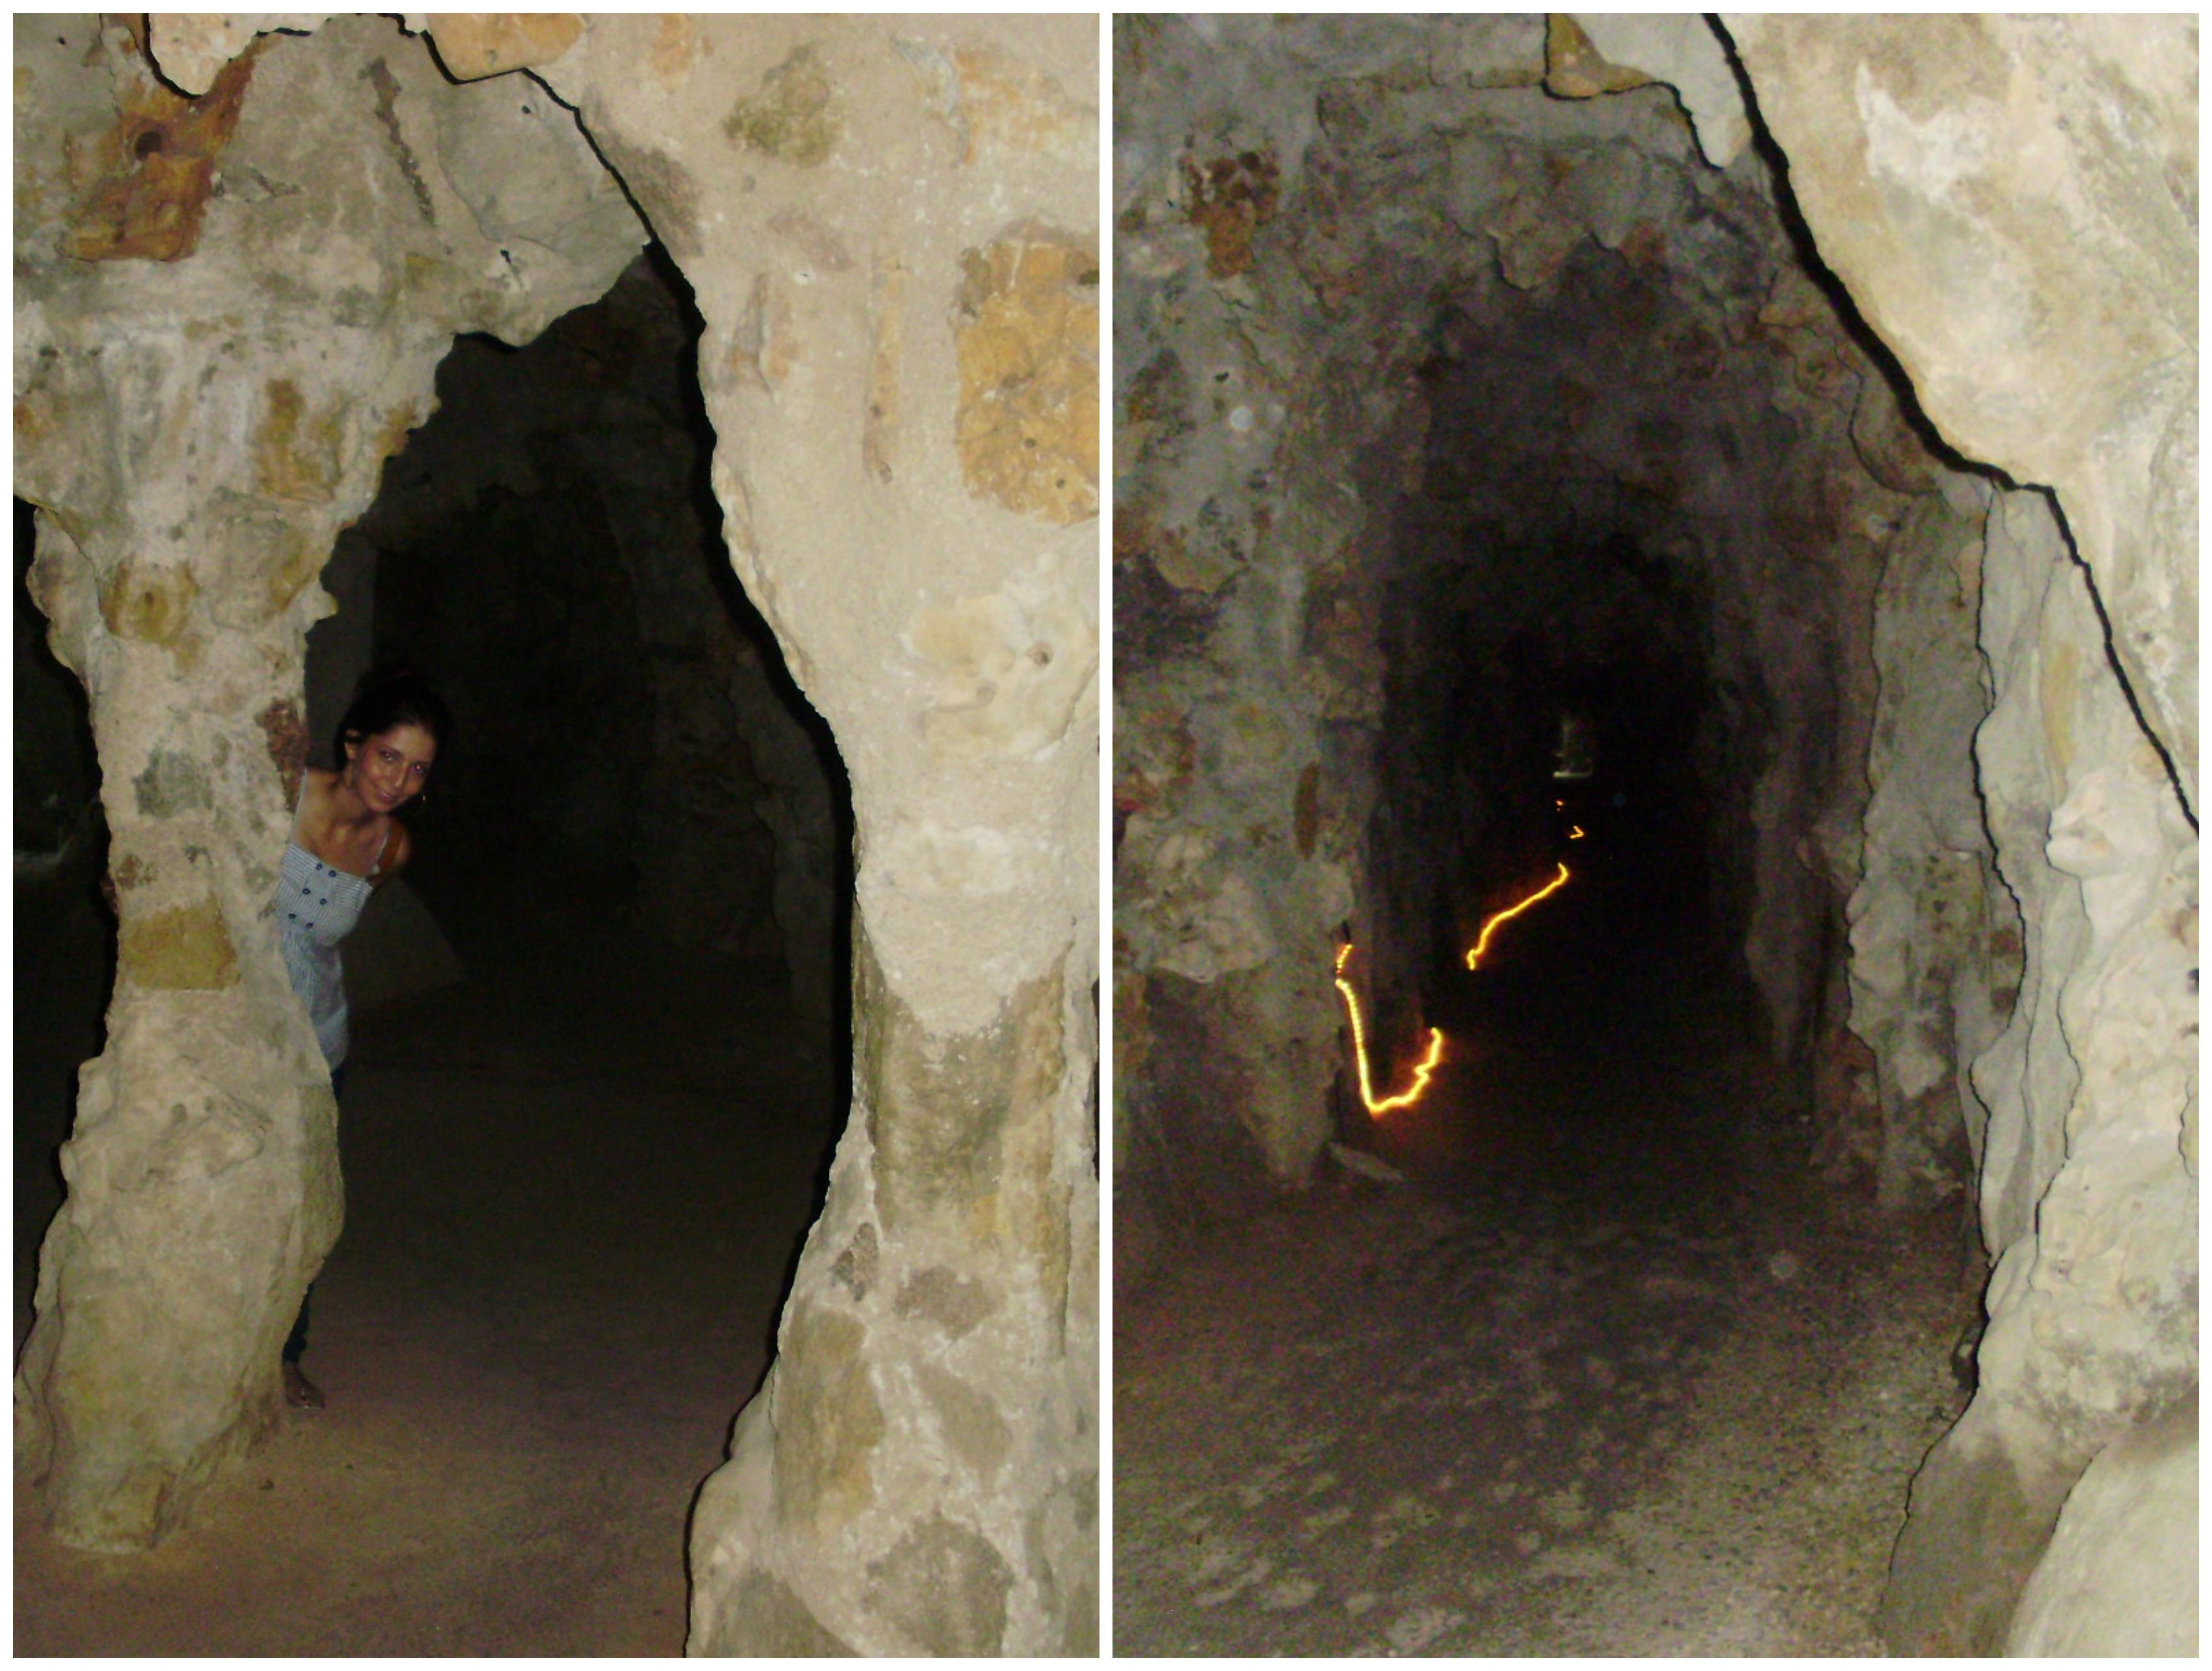 grutas.jpg